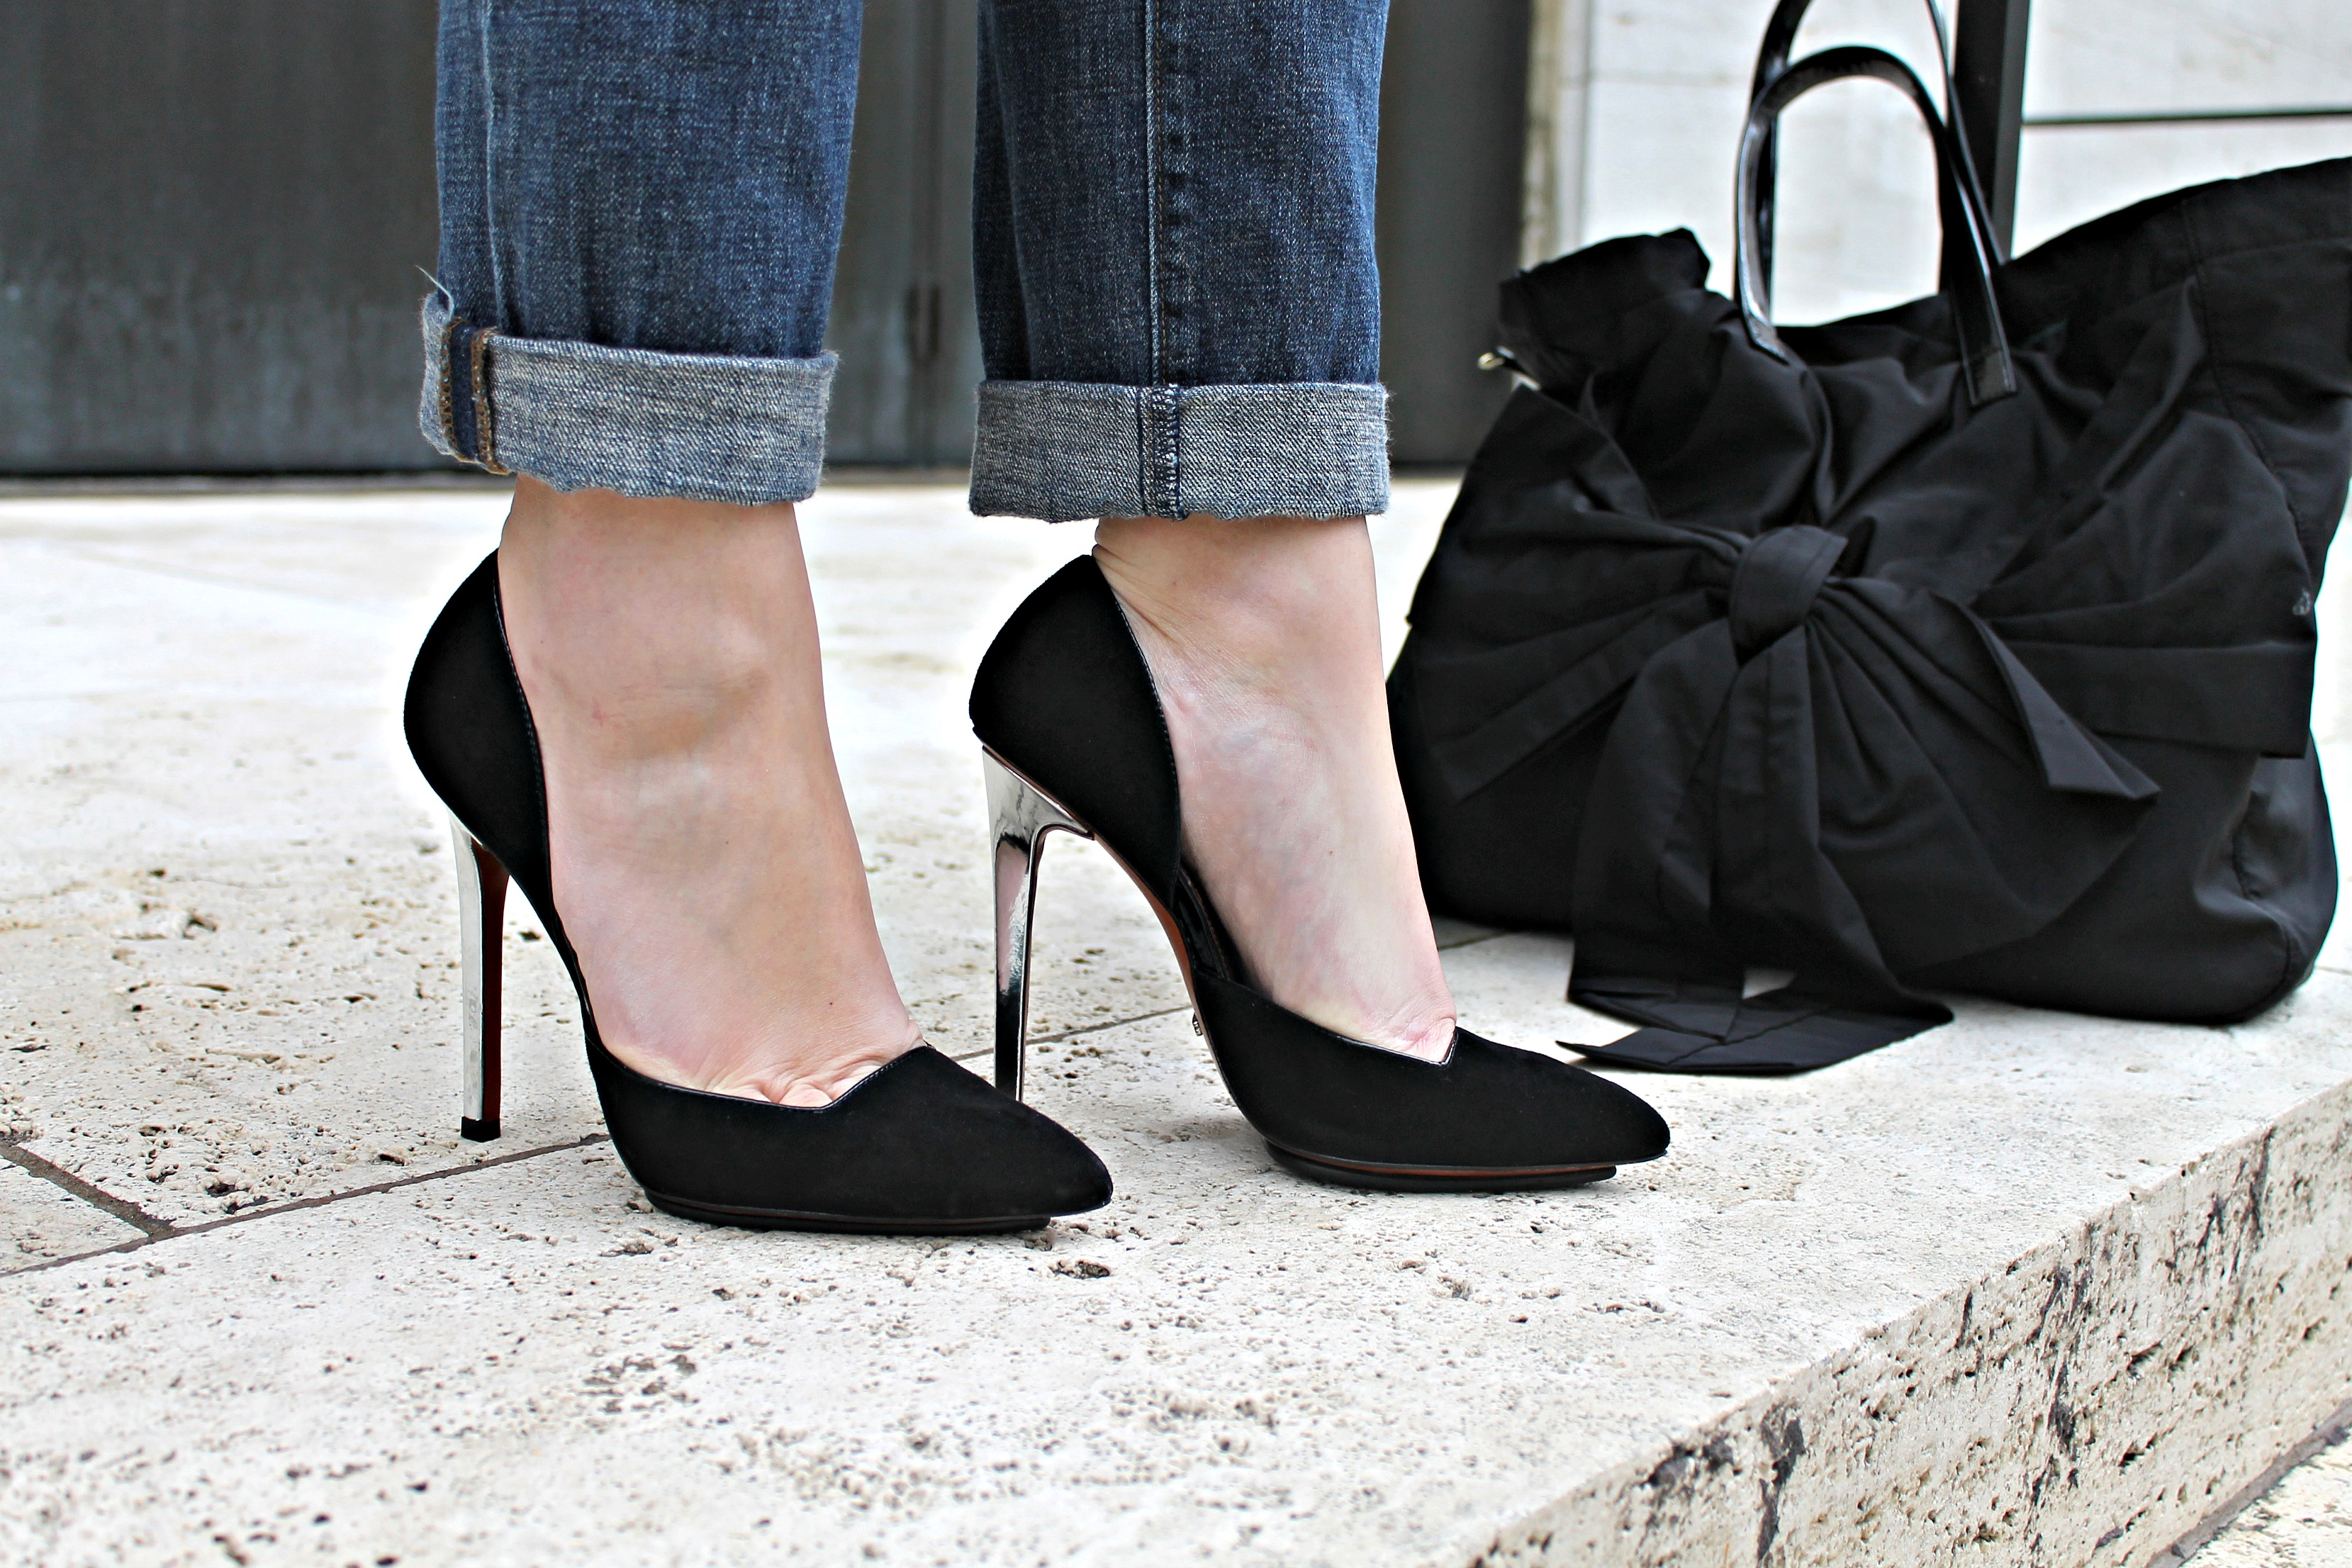 Schutz Shoes Schutz Shoes With Metallic